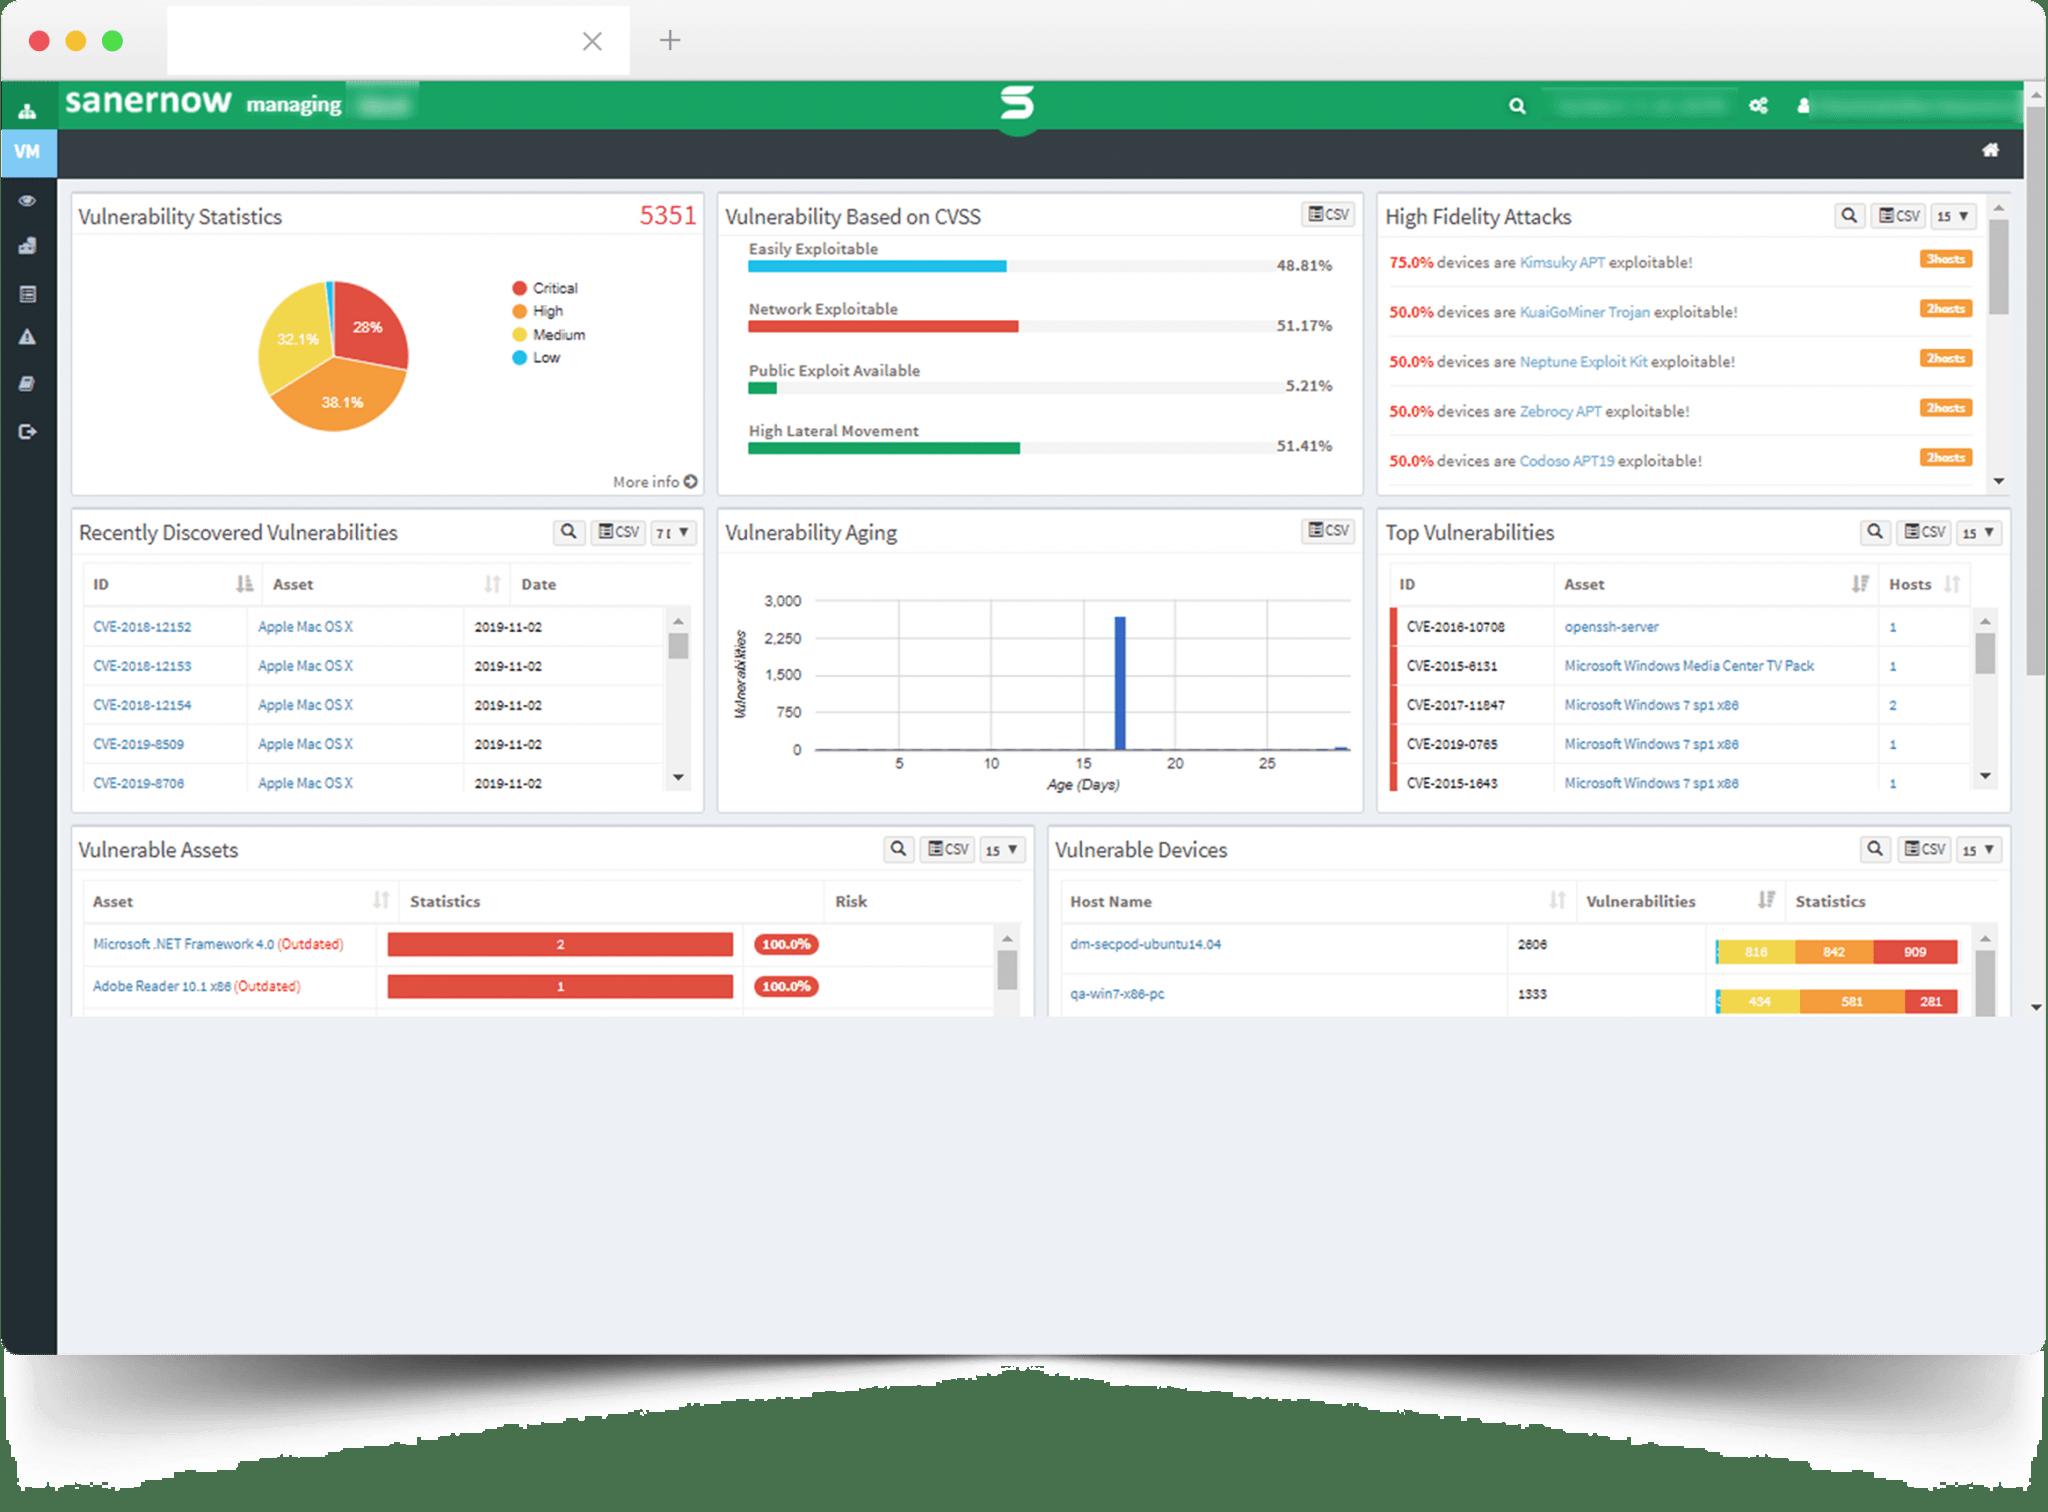 SanerNow Vulnerability Management Software